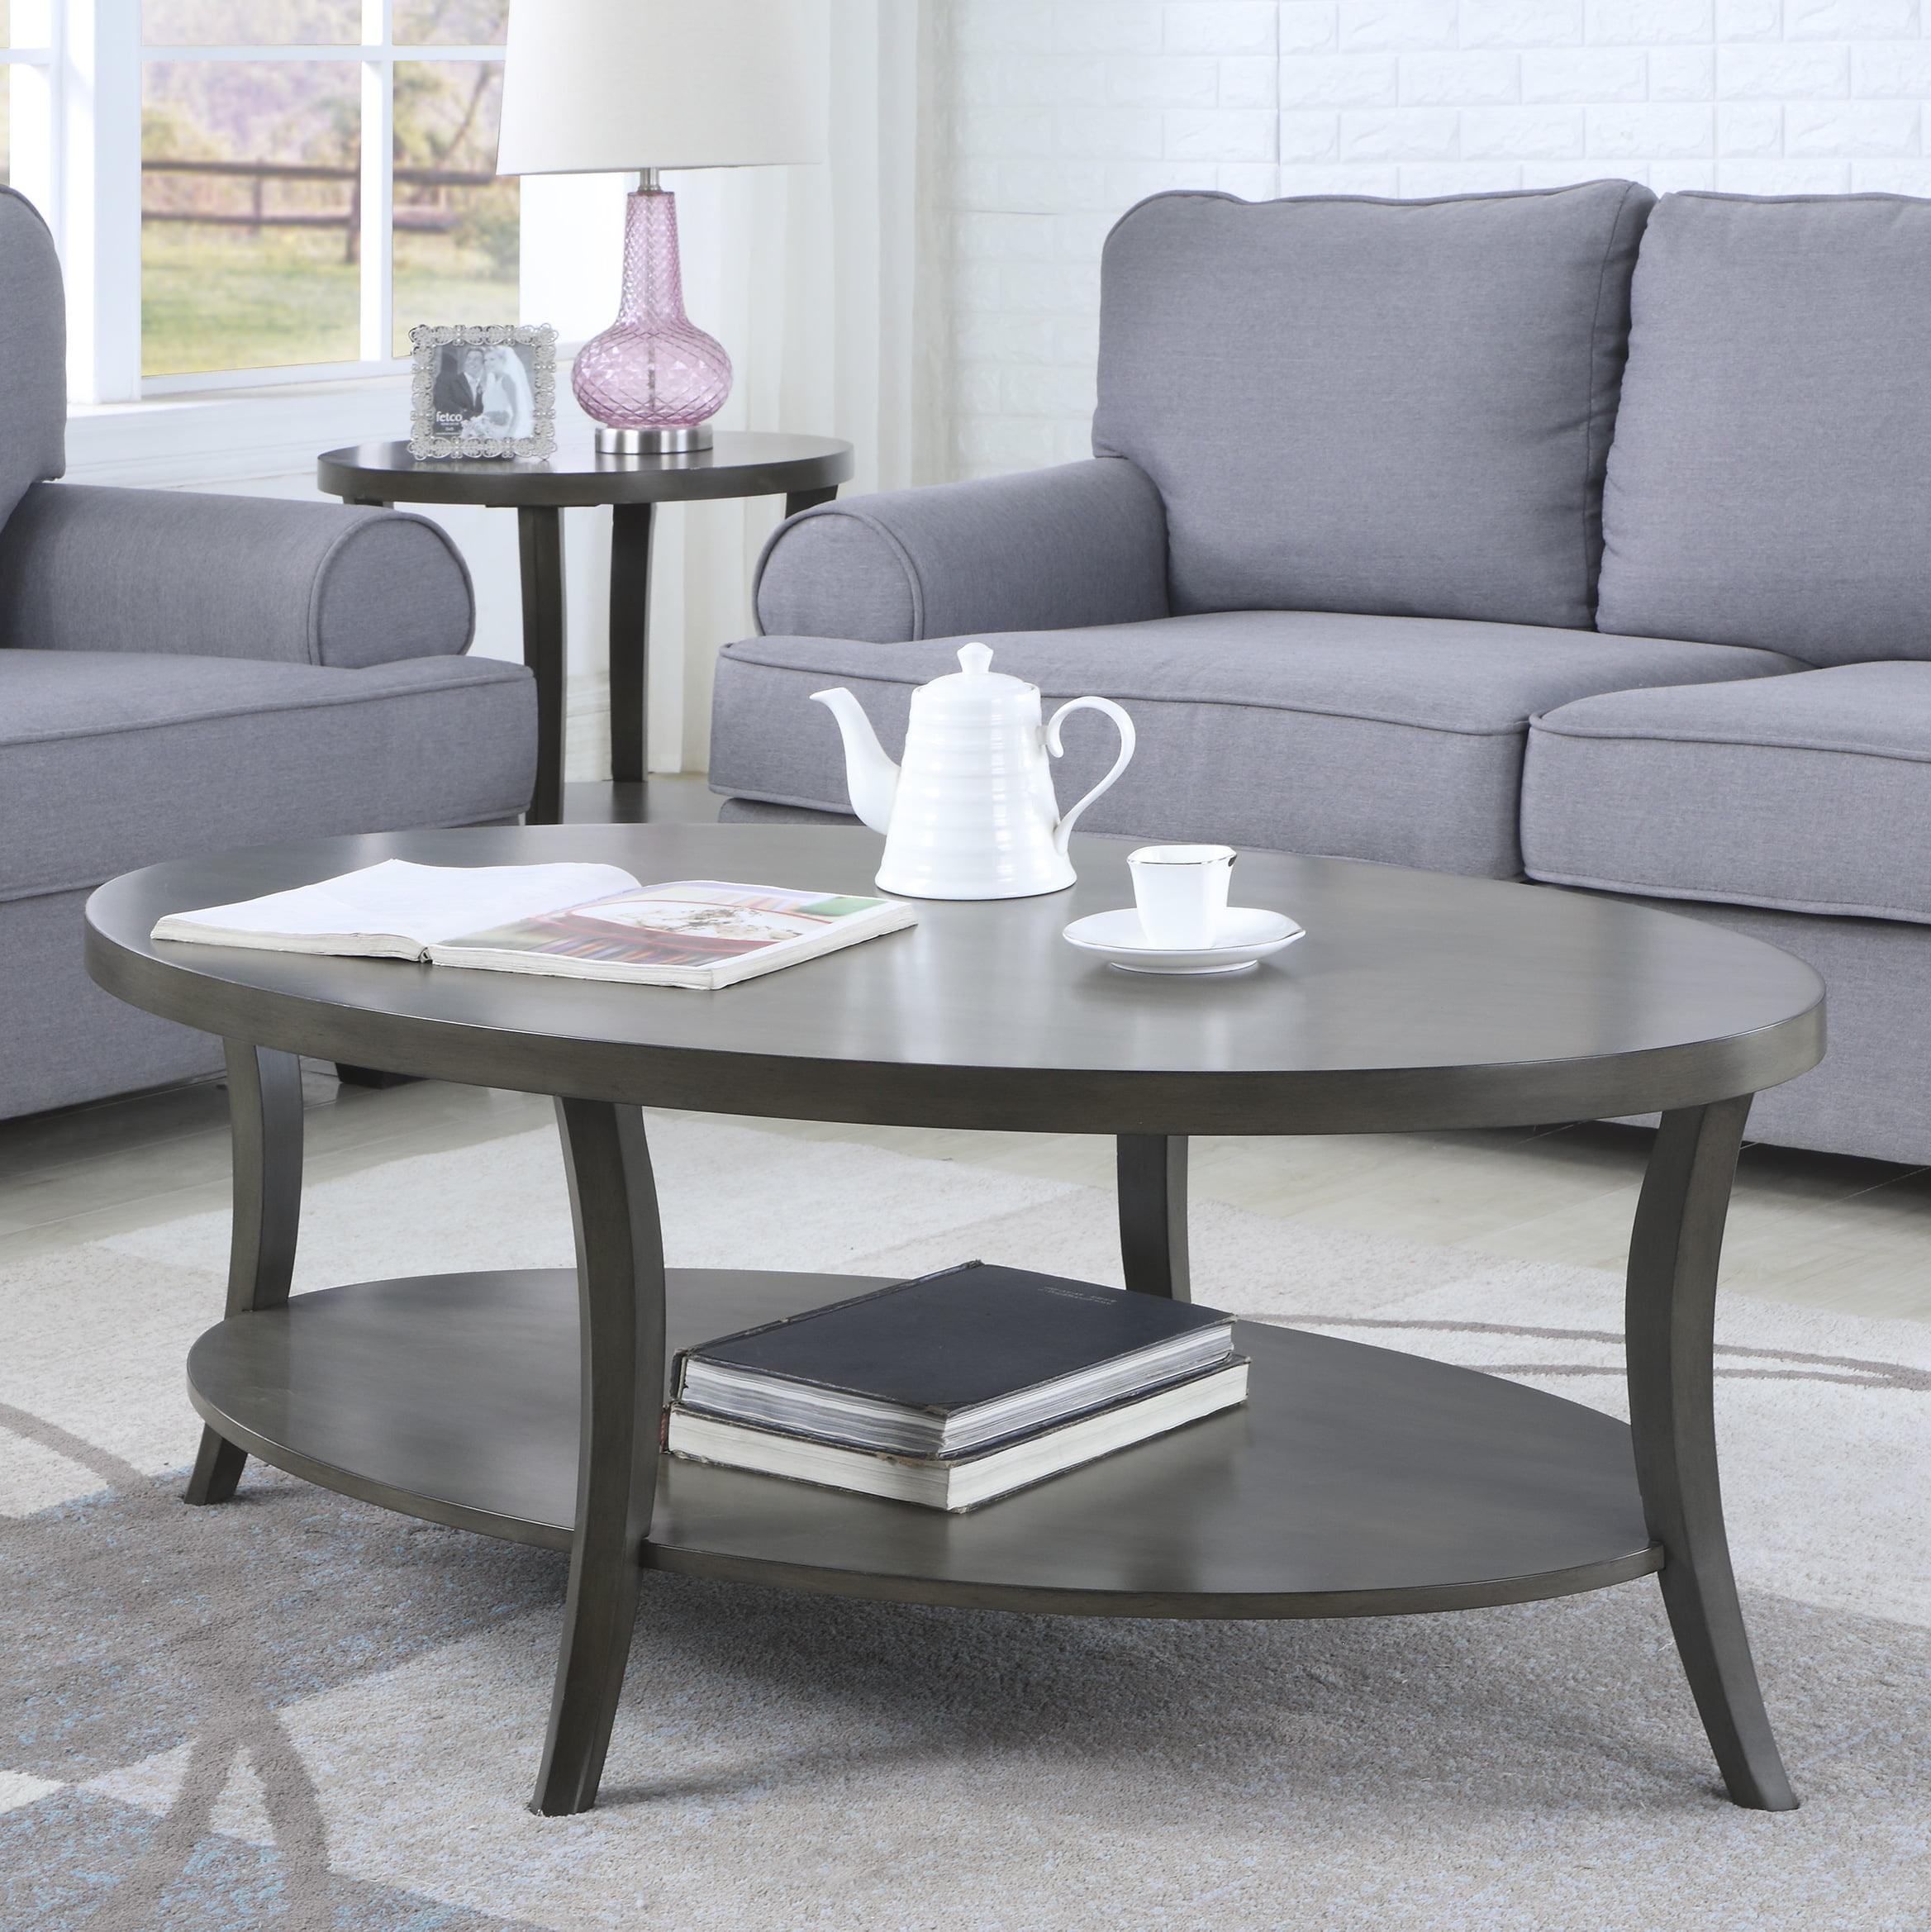 Roundhill Perth Contemporary Oval Shelf Coffee Table, Gray